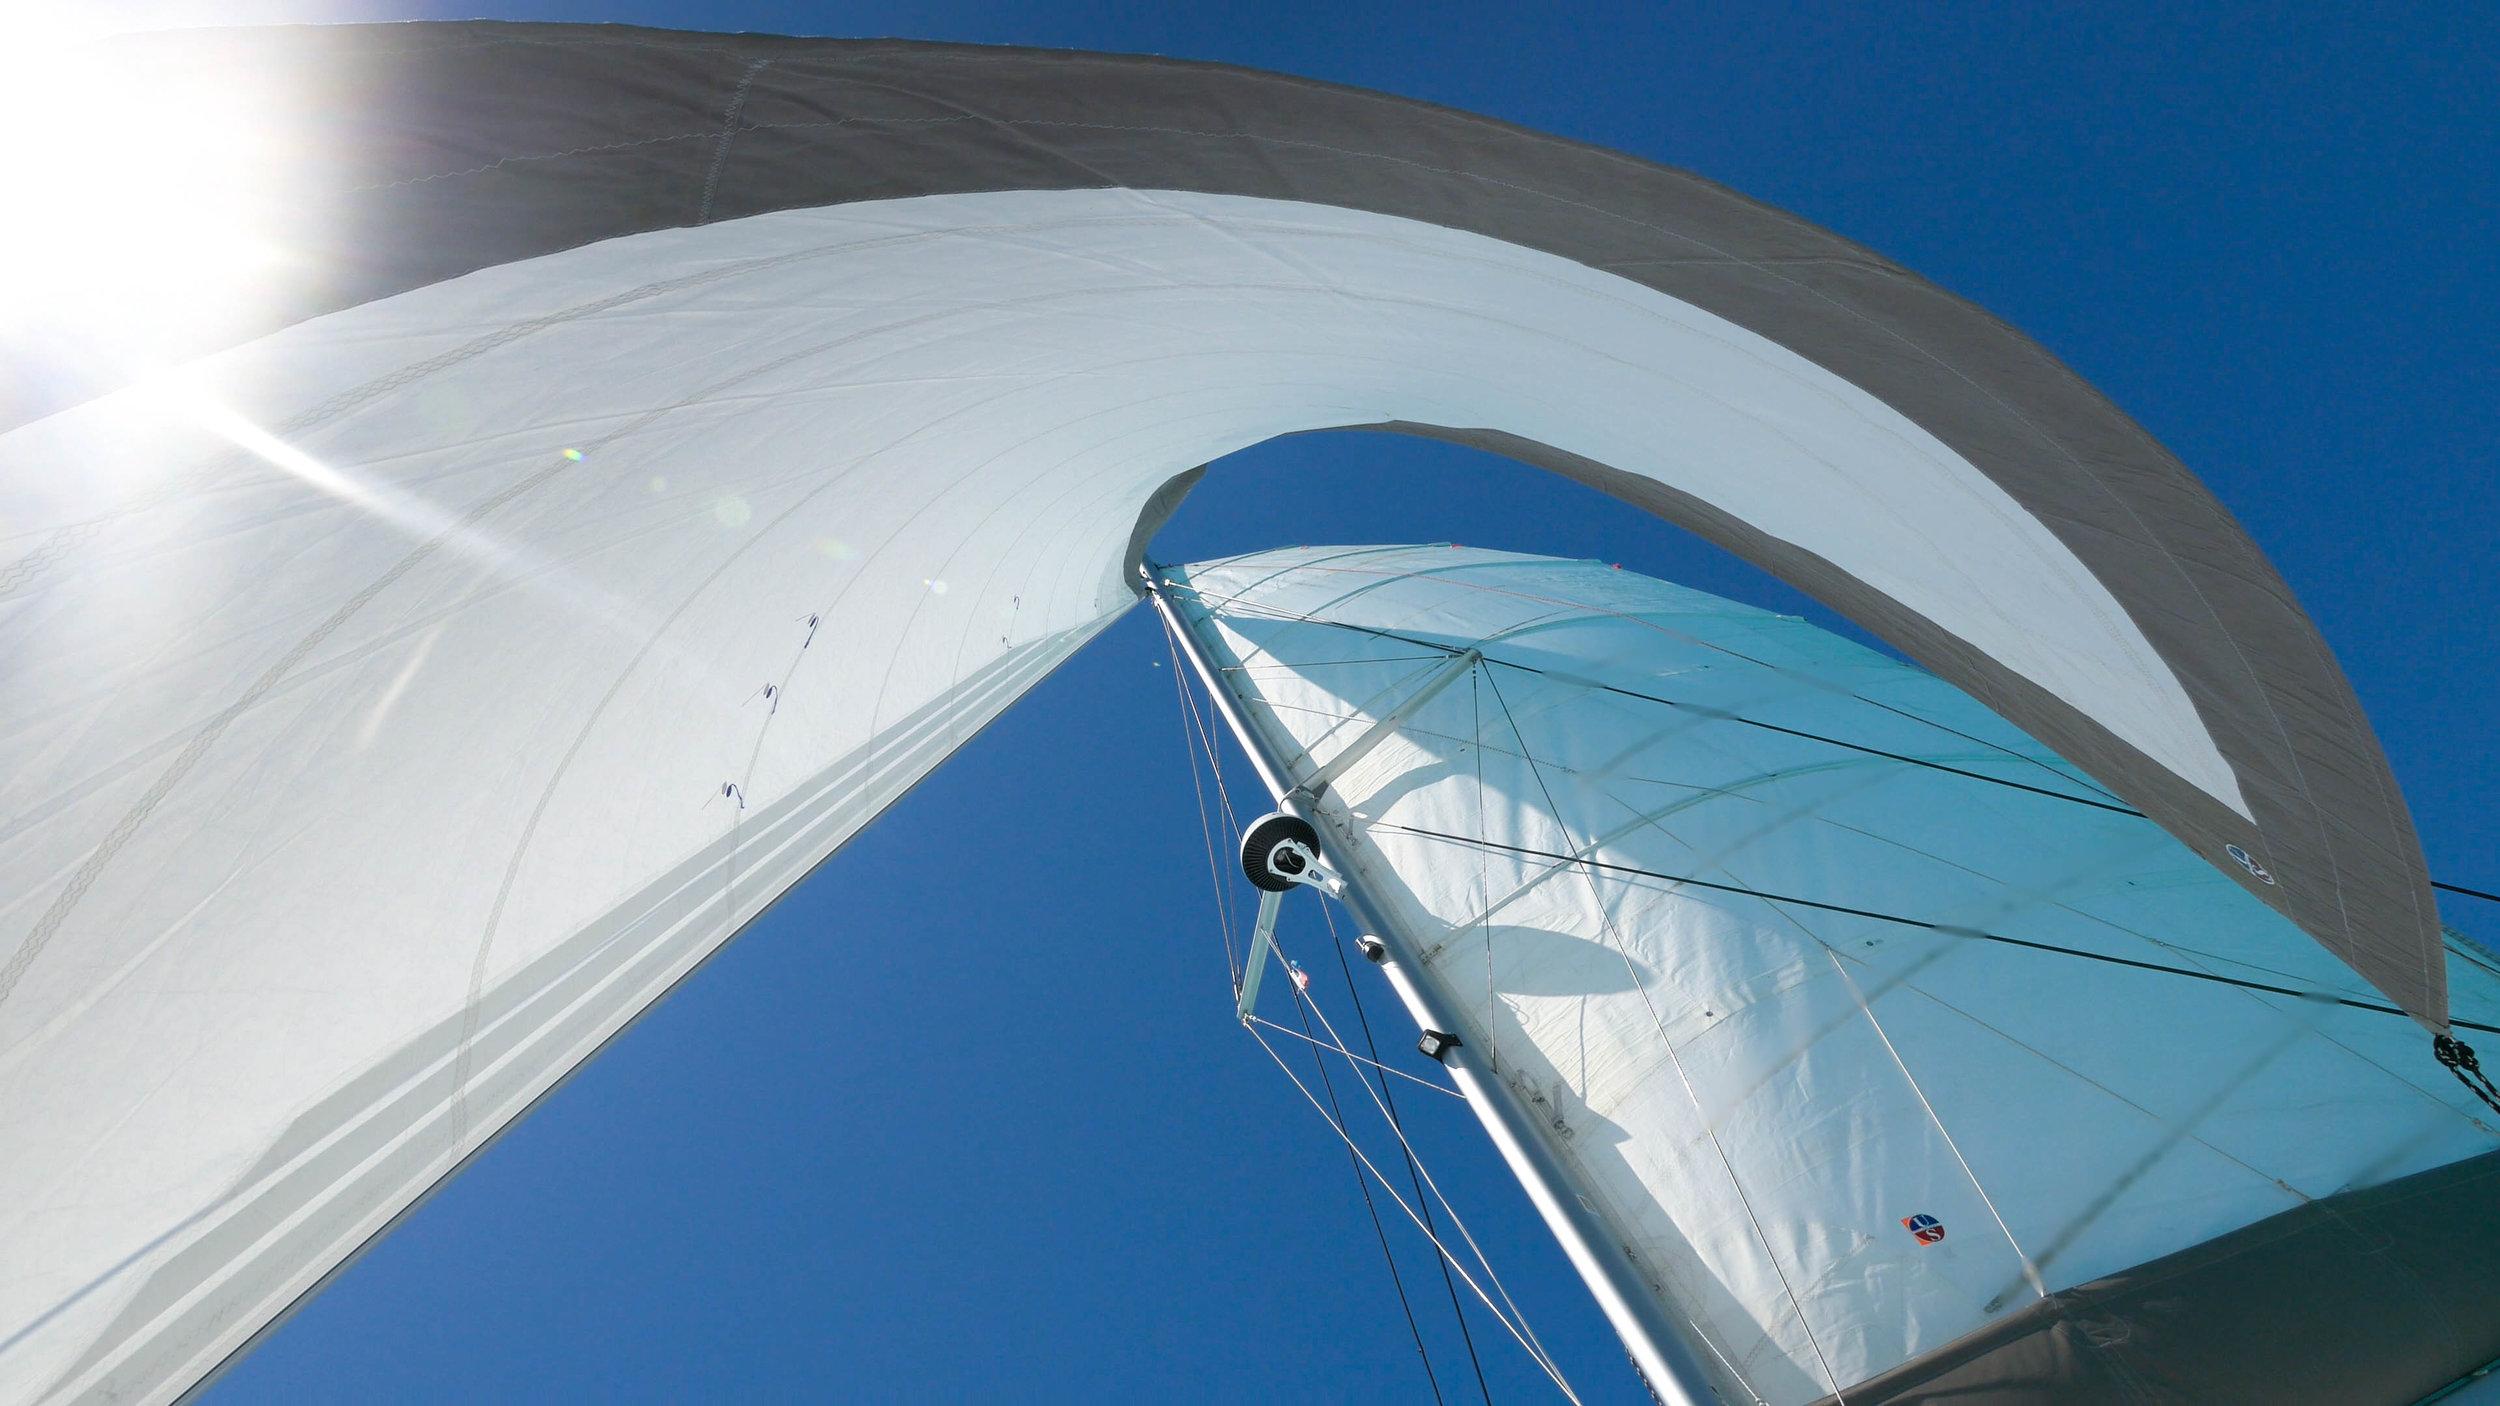 sails 1.jpg